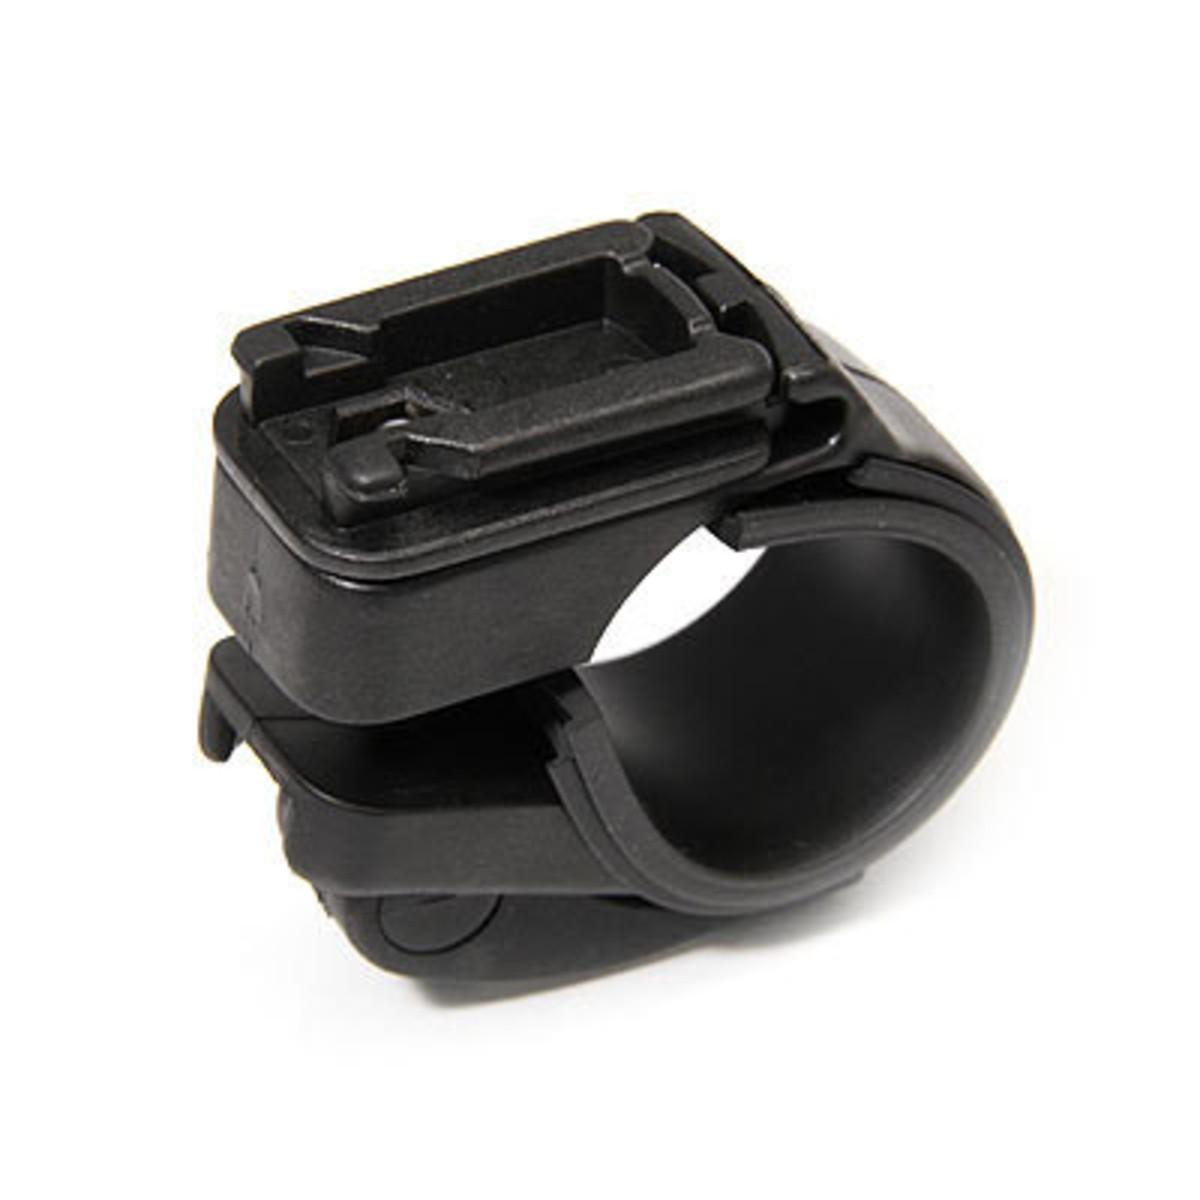 Cateye H-31 Front Head Light Handlebar Bracket 28 - 31.8mm Handlebar Diameter